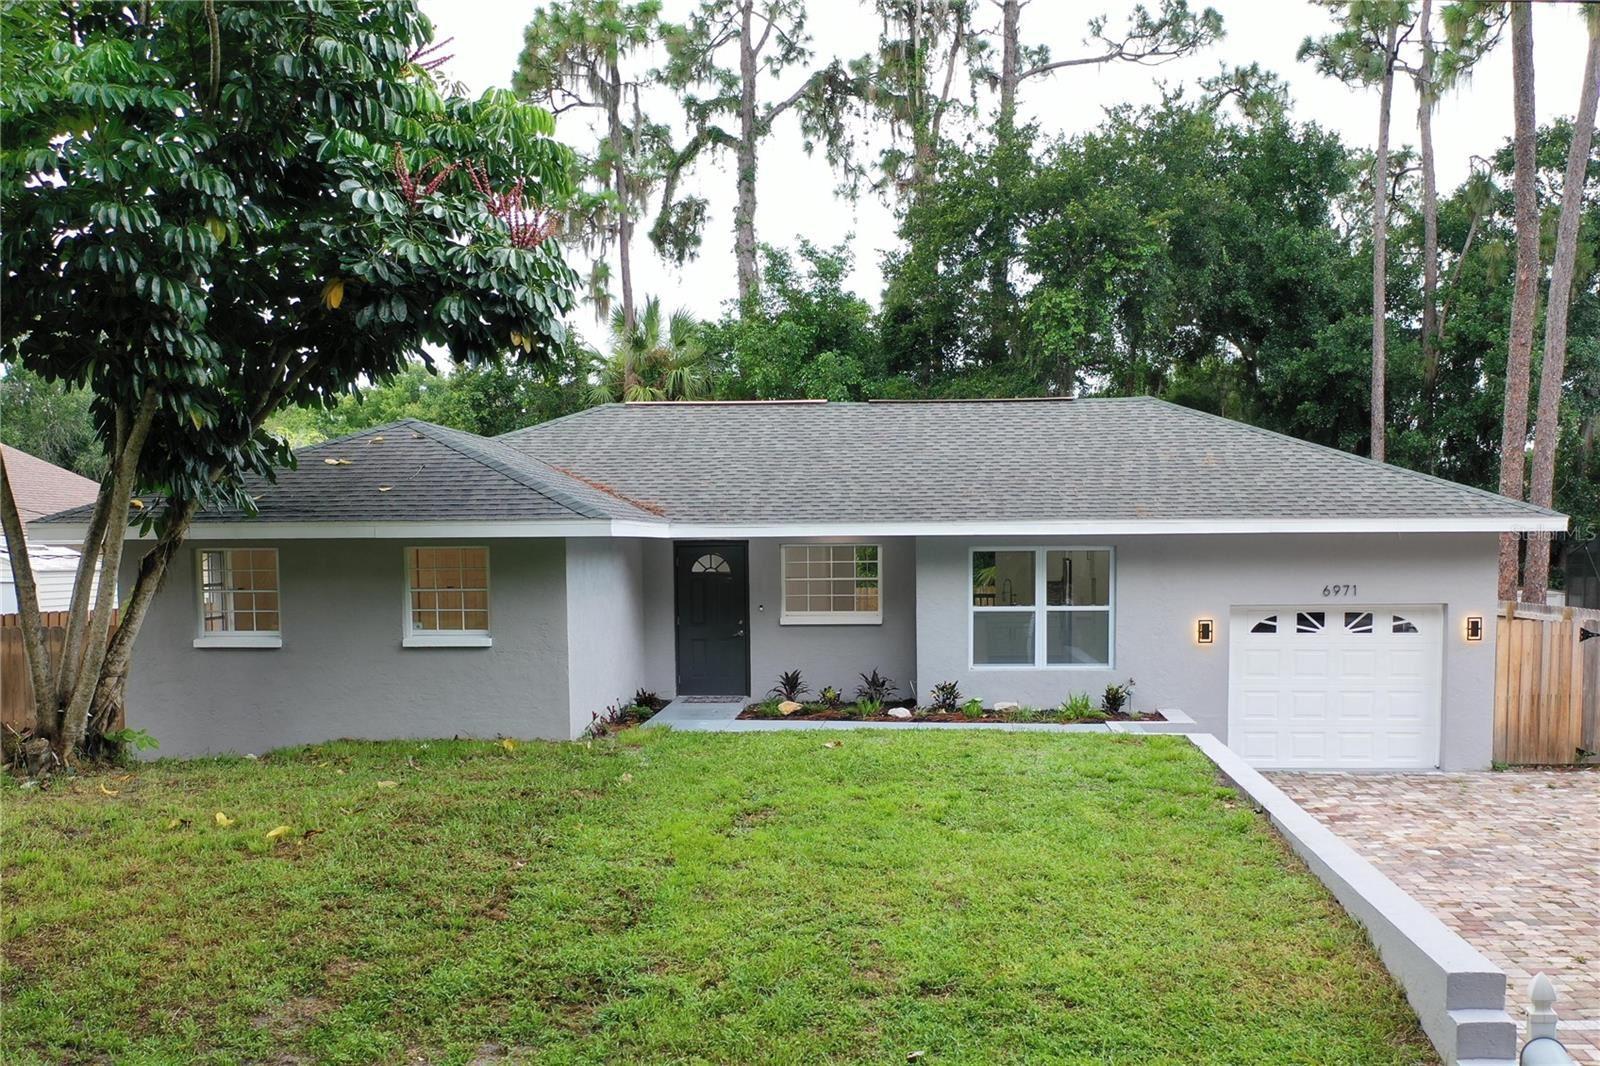 6971 JARVIS ROAD, Sarasota, FL 34241 - #: A4506574